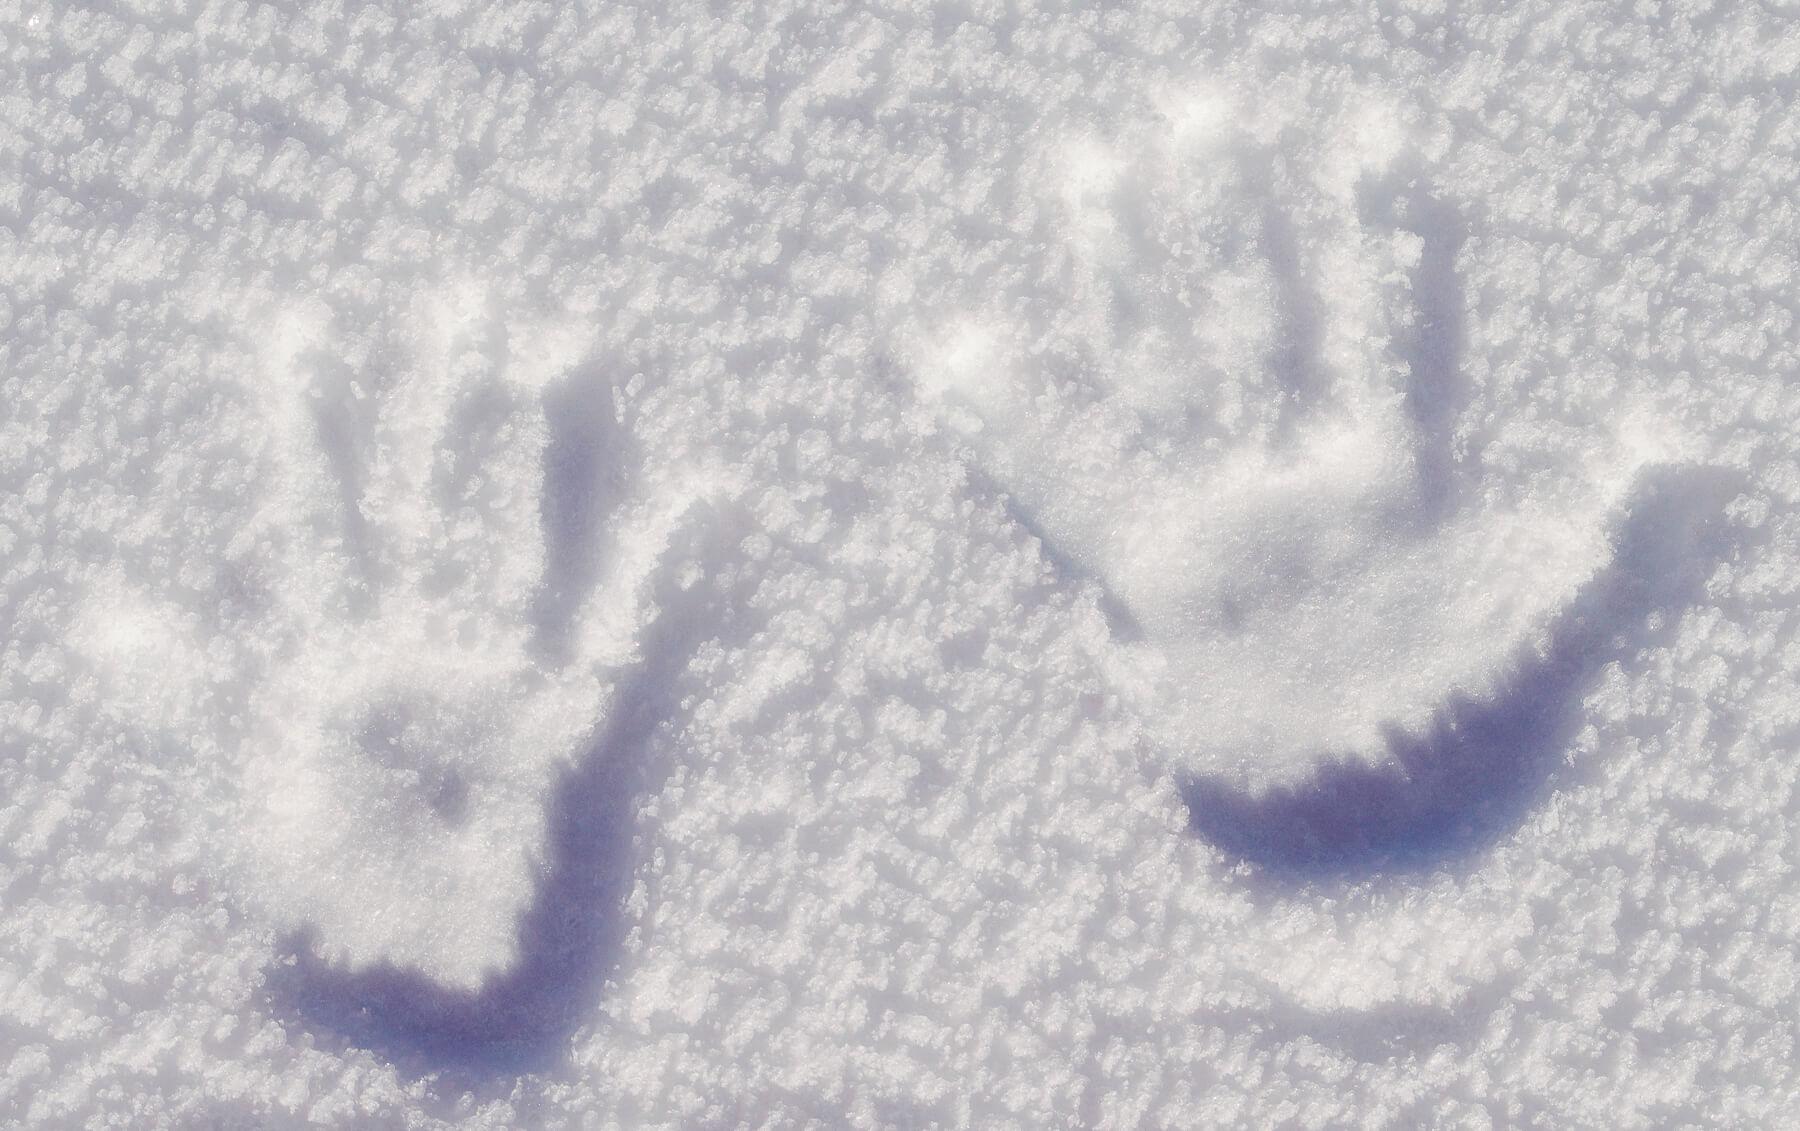 2 Handprints in the Snow